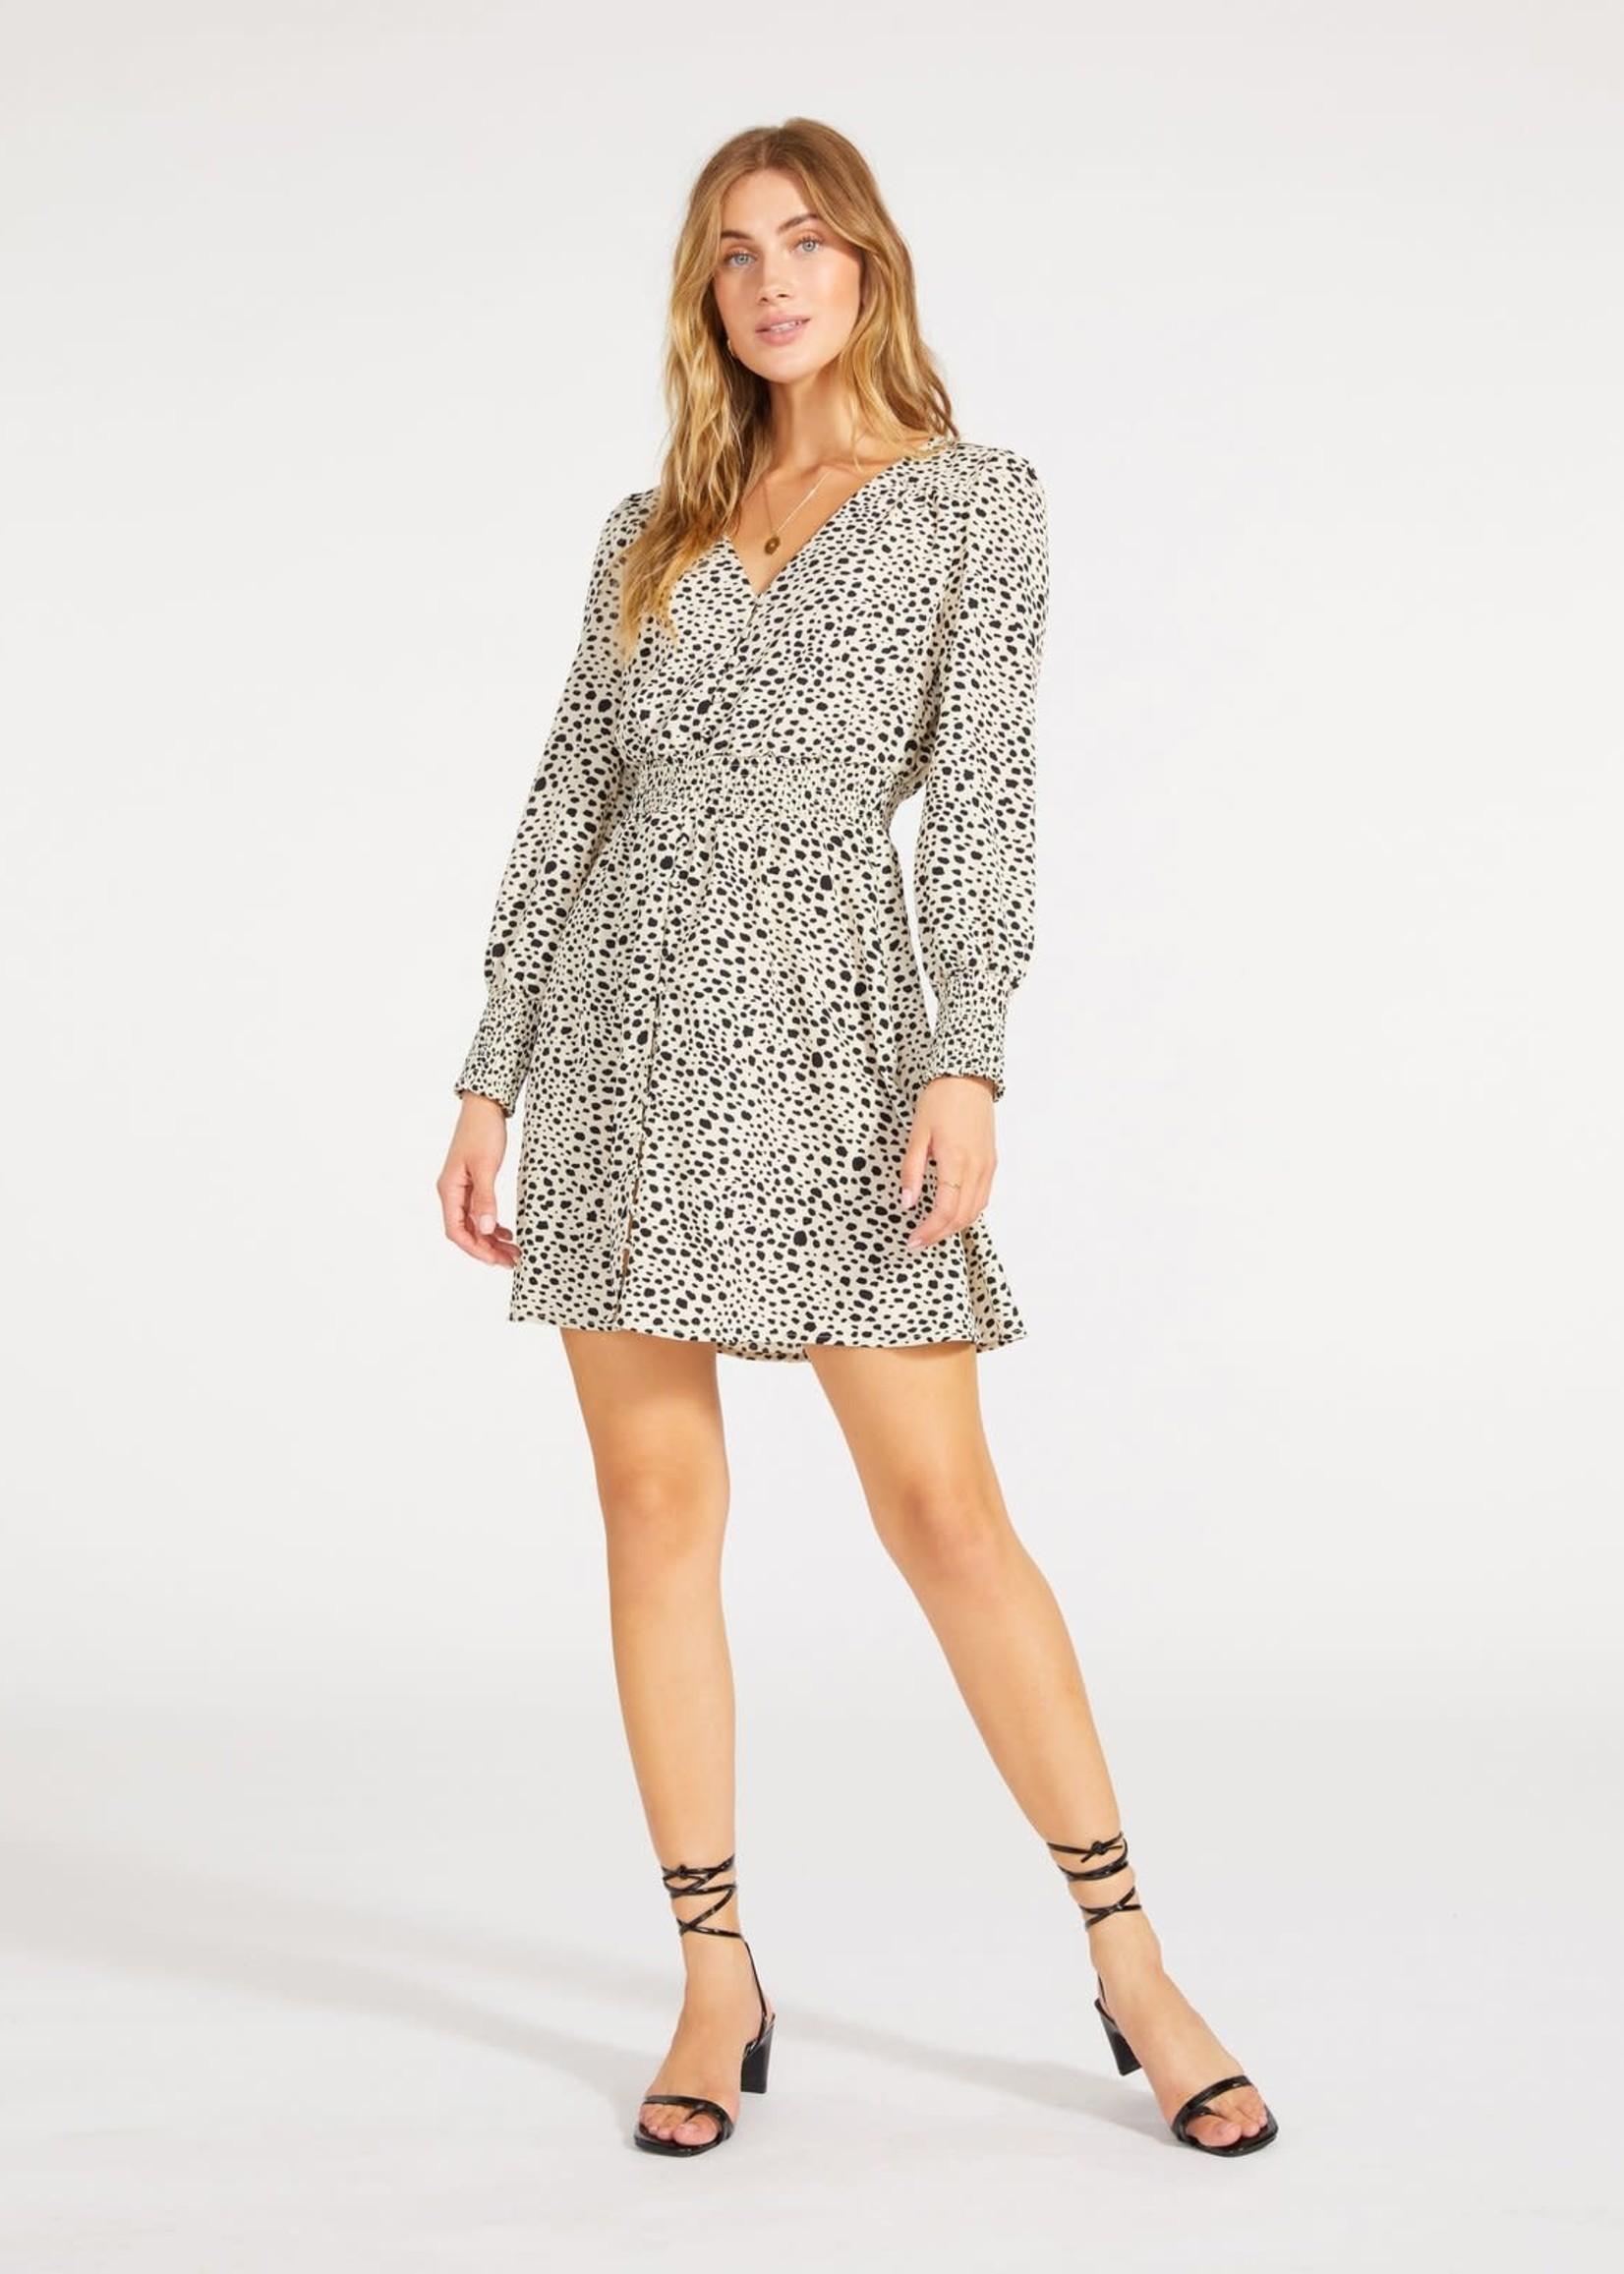 BB DAKOTA Spot a Cutie Dress